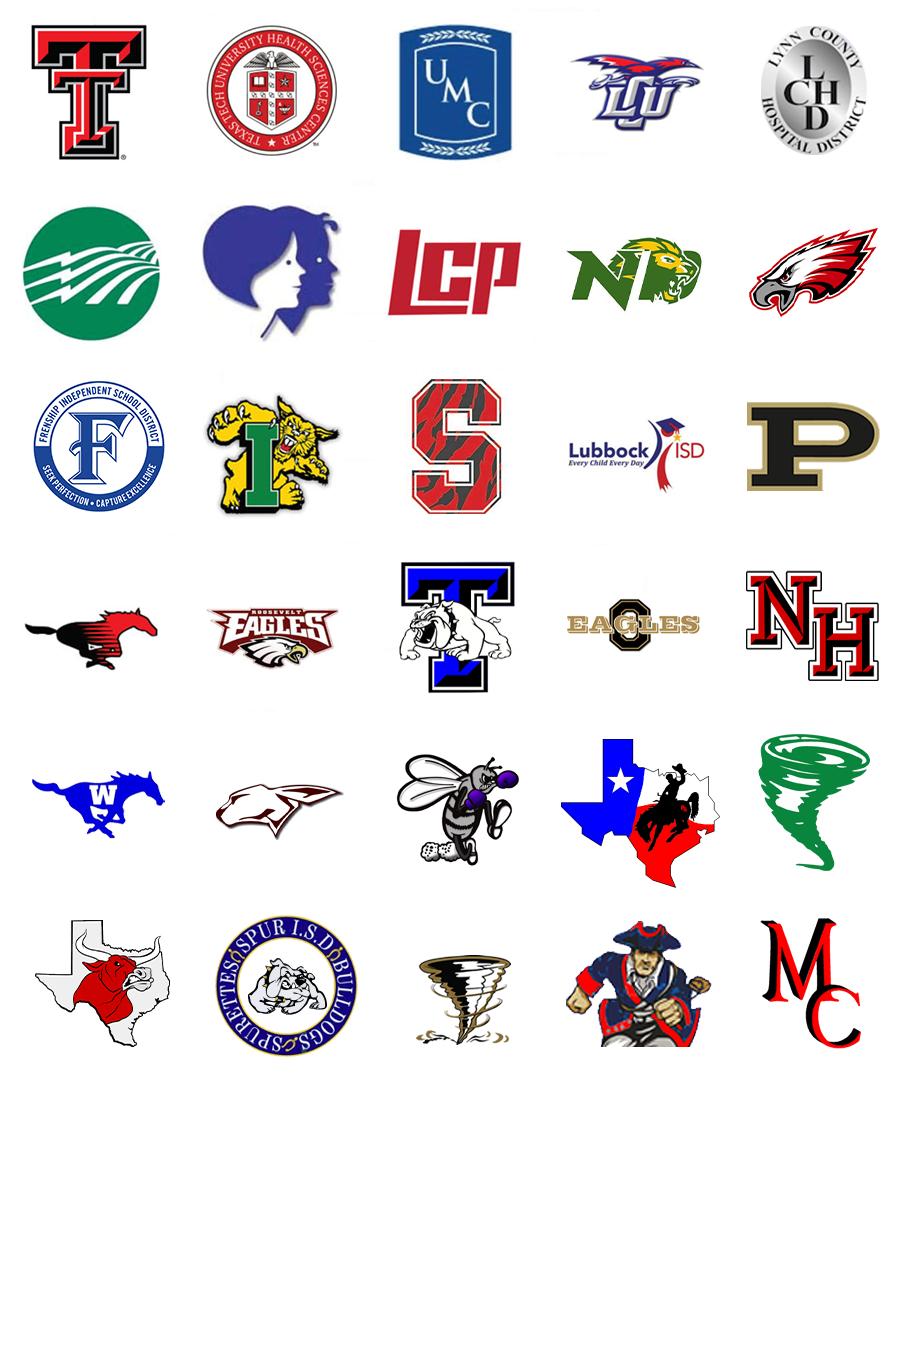 affiliation_logos 2020